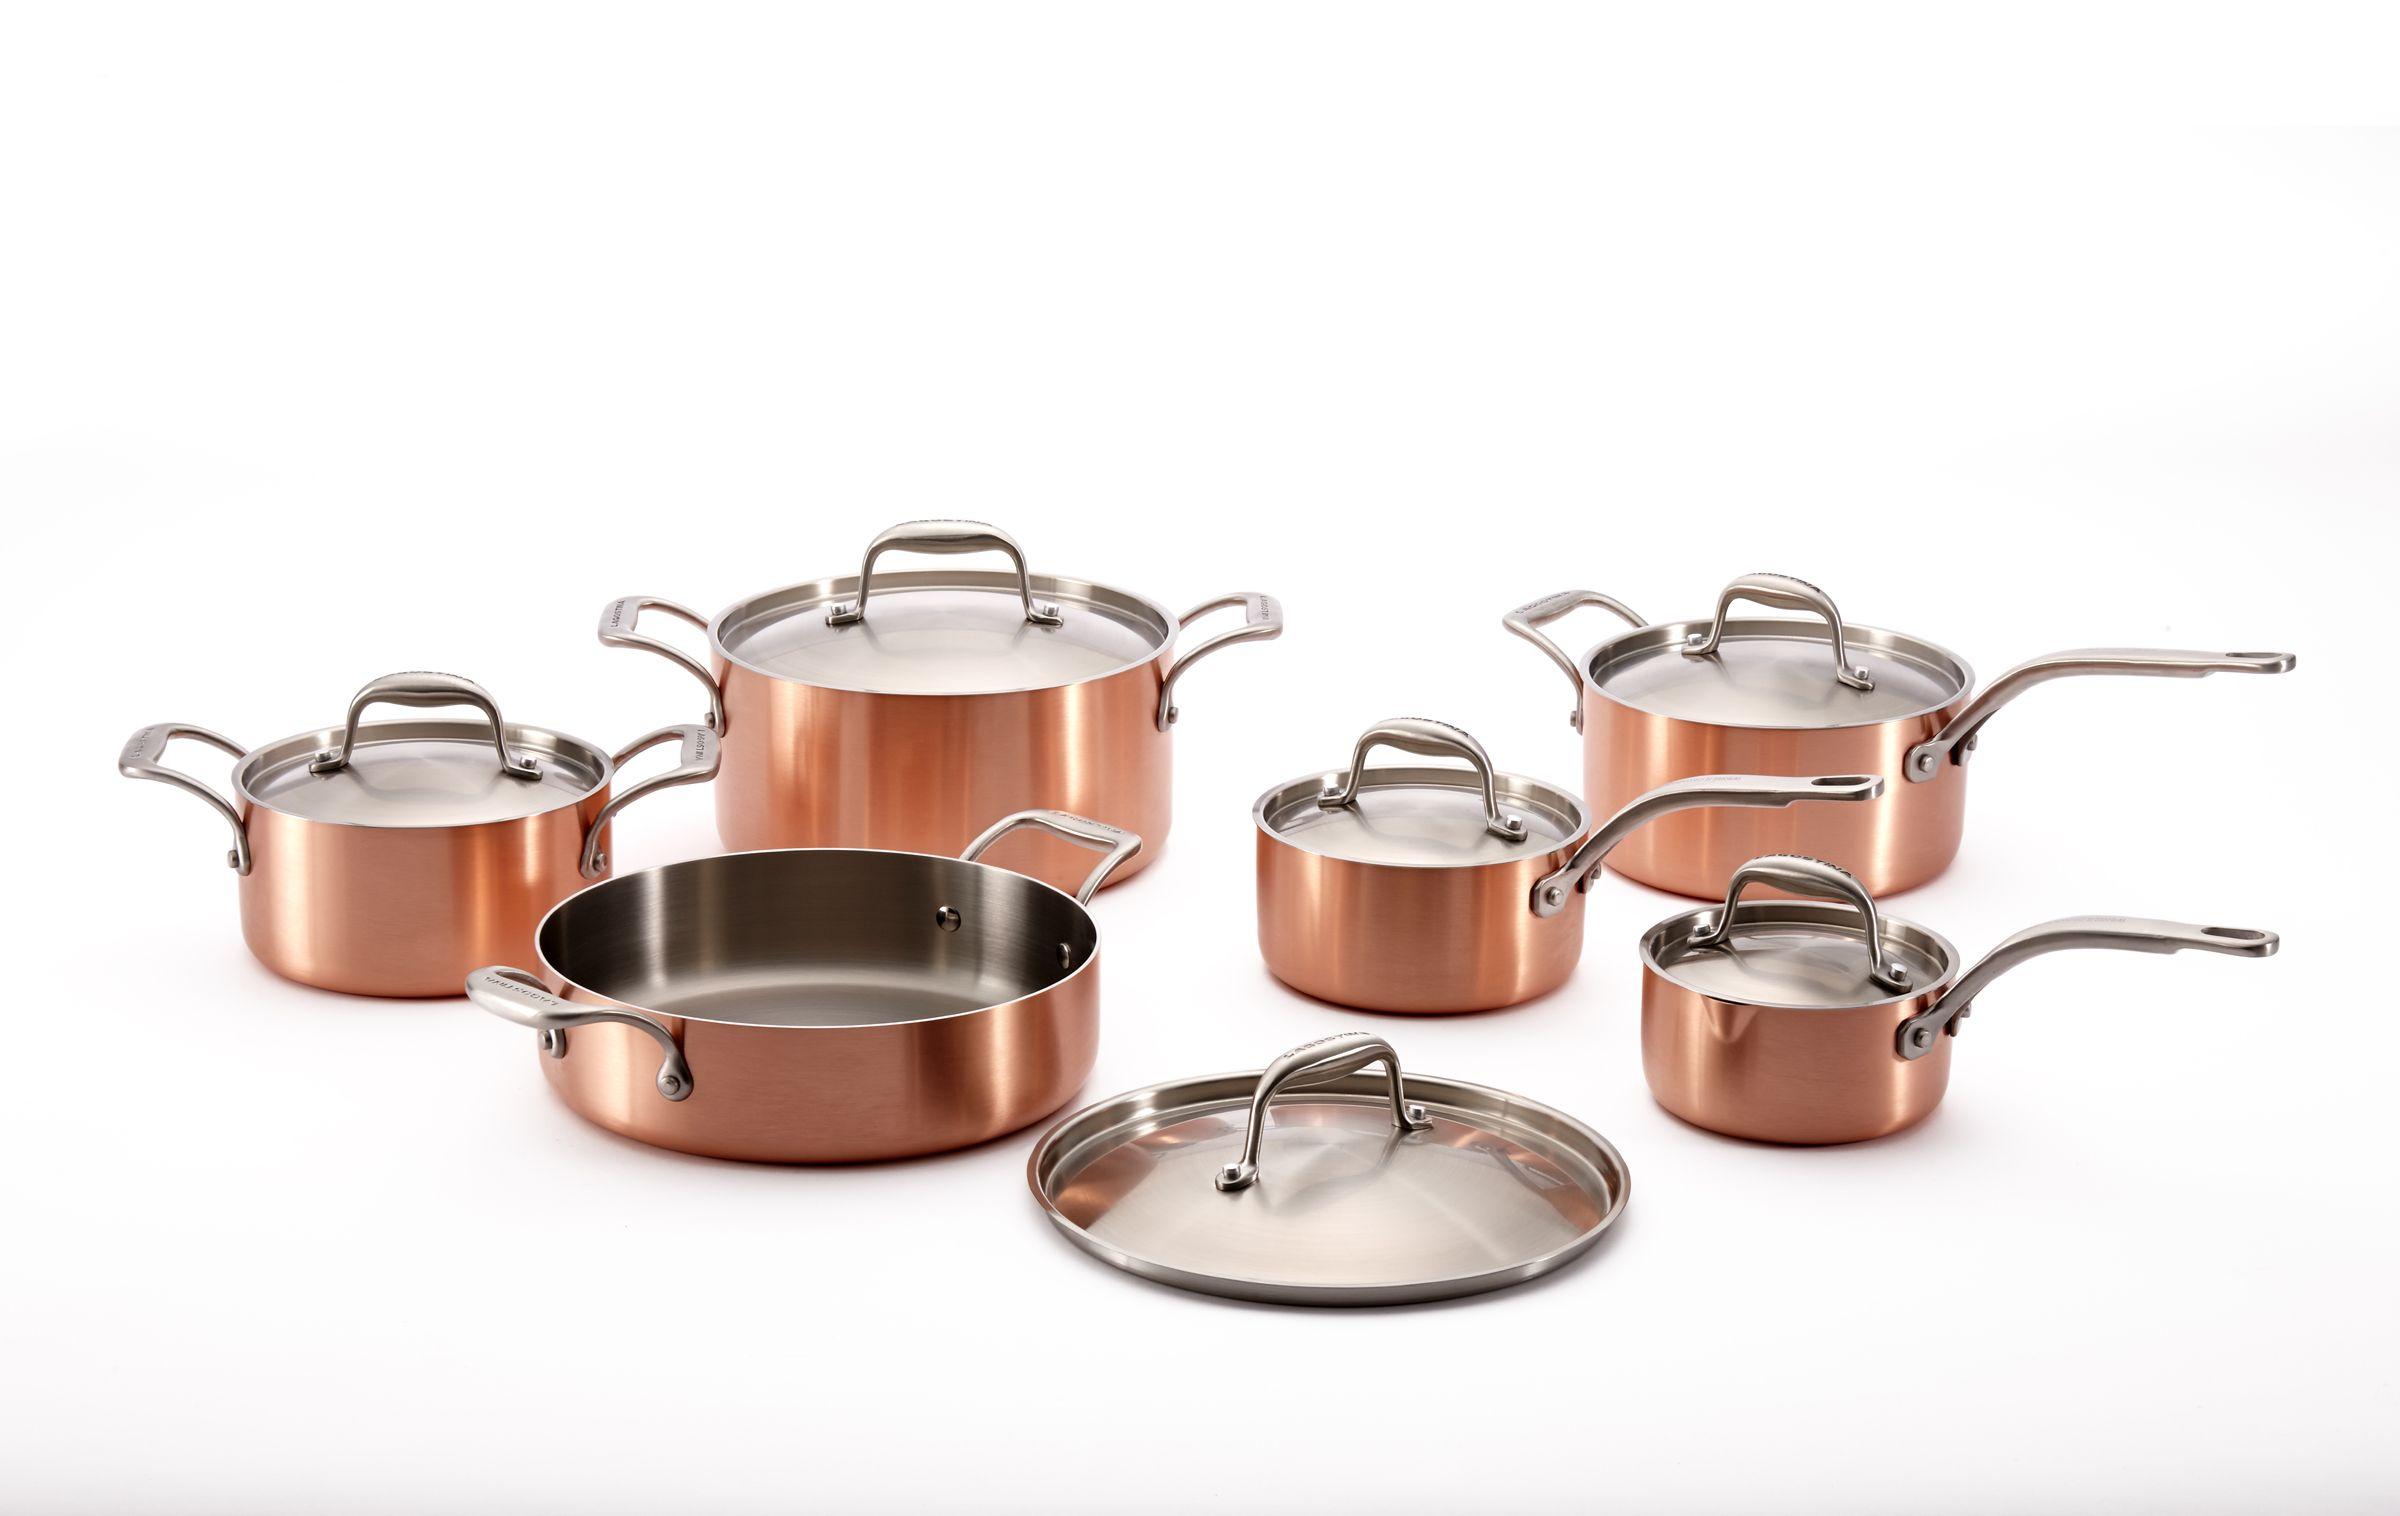 European Kitchen Gadgets Cabinet Knobs And Pulls Lagostina Copper Euro Clad 12 Pc Food Stuffs Tools